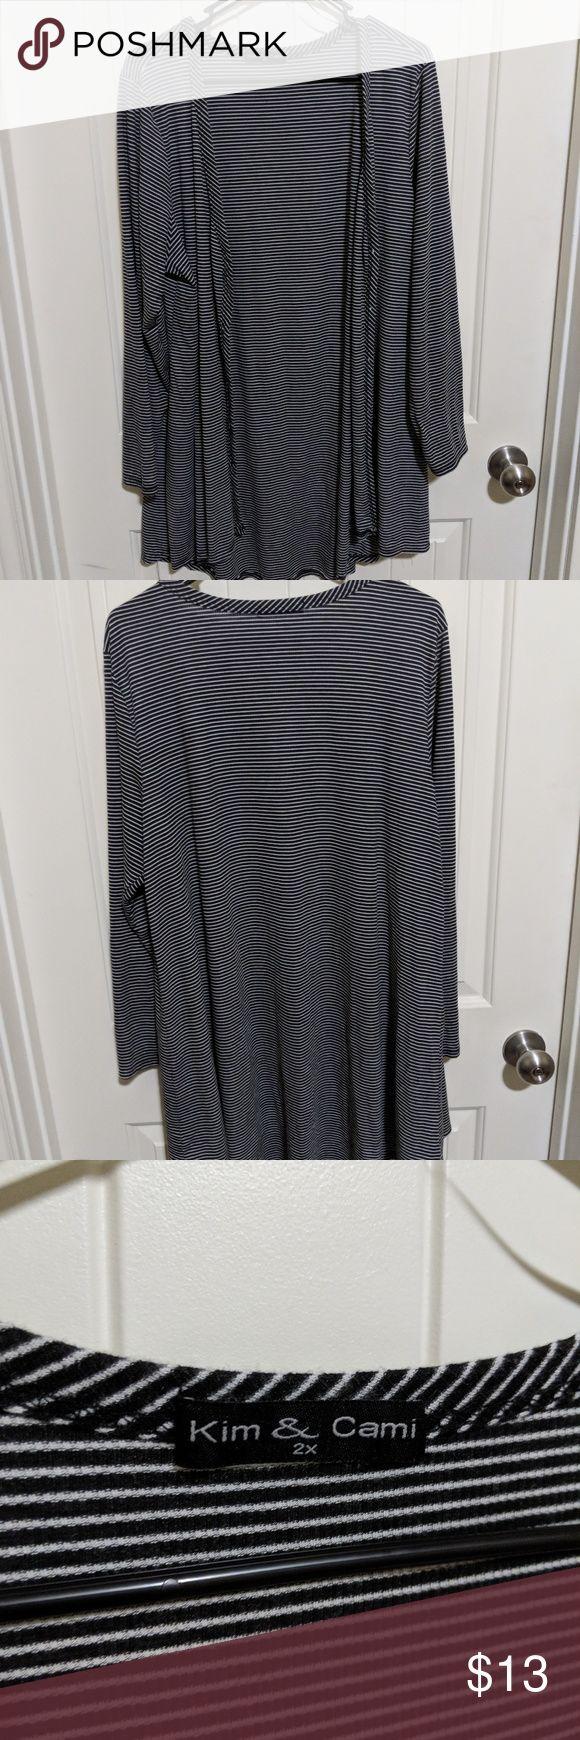 Striped Cardigan Black and White striped cardigan. Kim & Cami Sweaters Cardigans